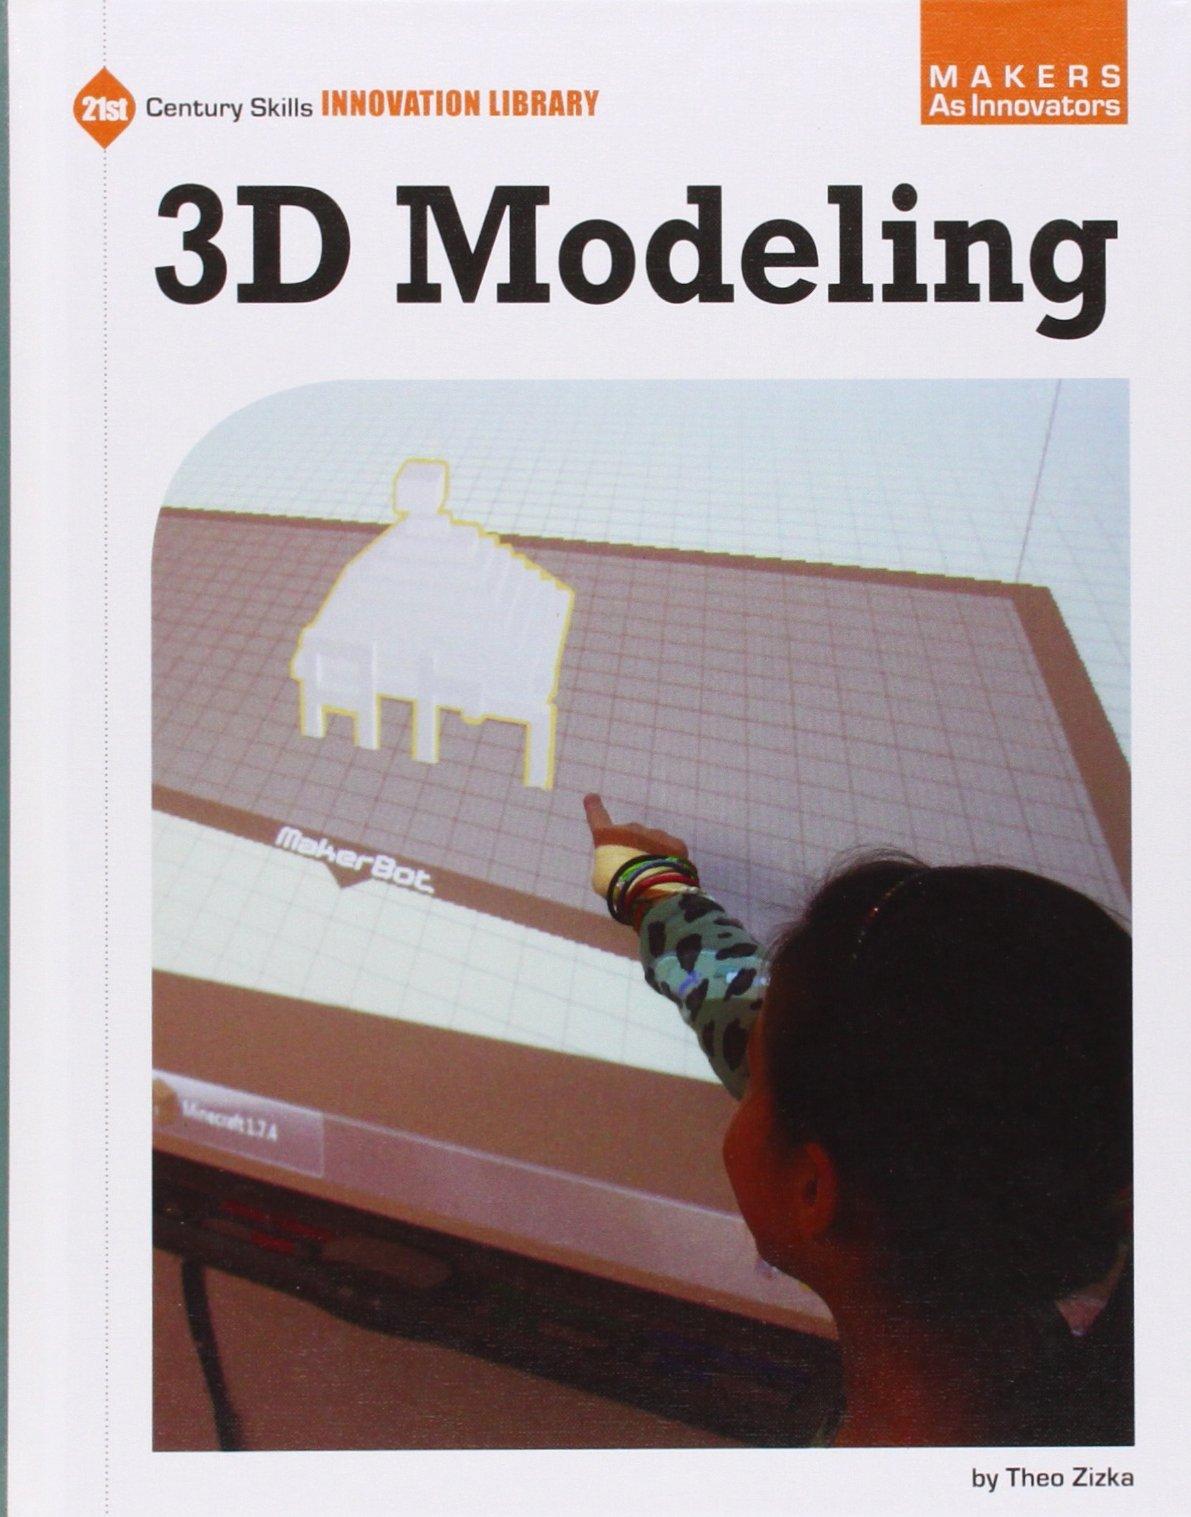 3d Modeling (21st Century Skills Innovation Library: Makers As Innovators)